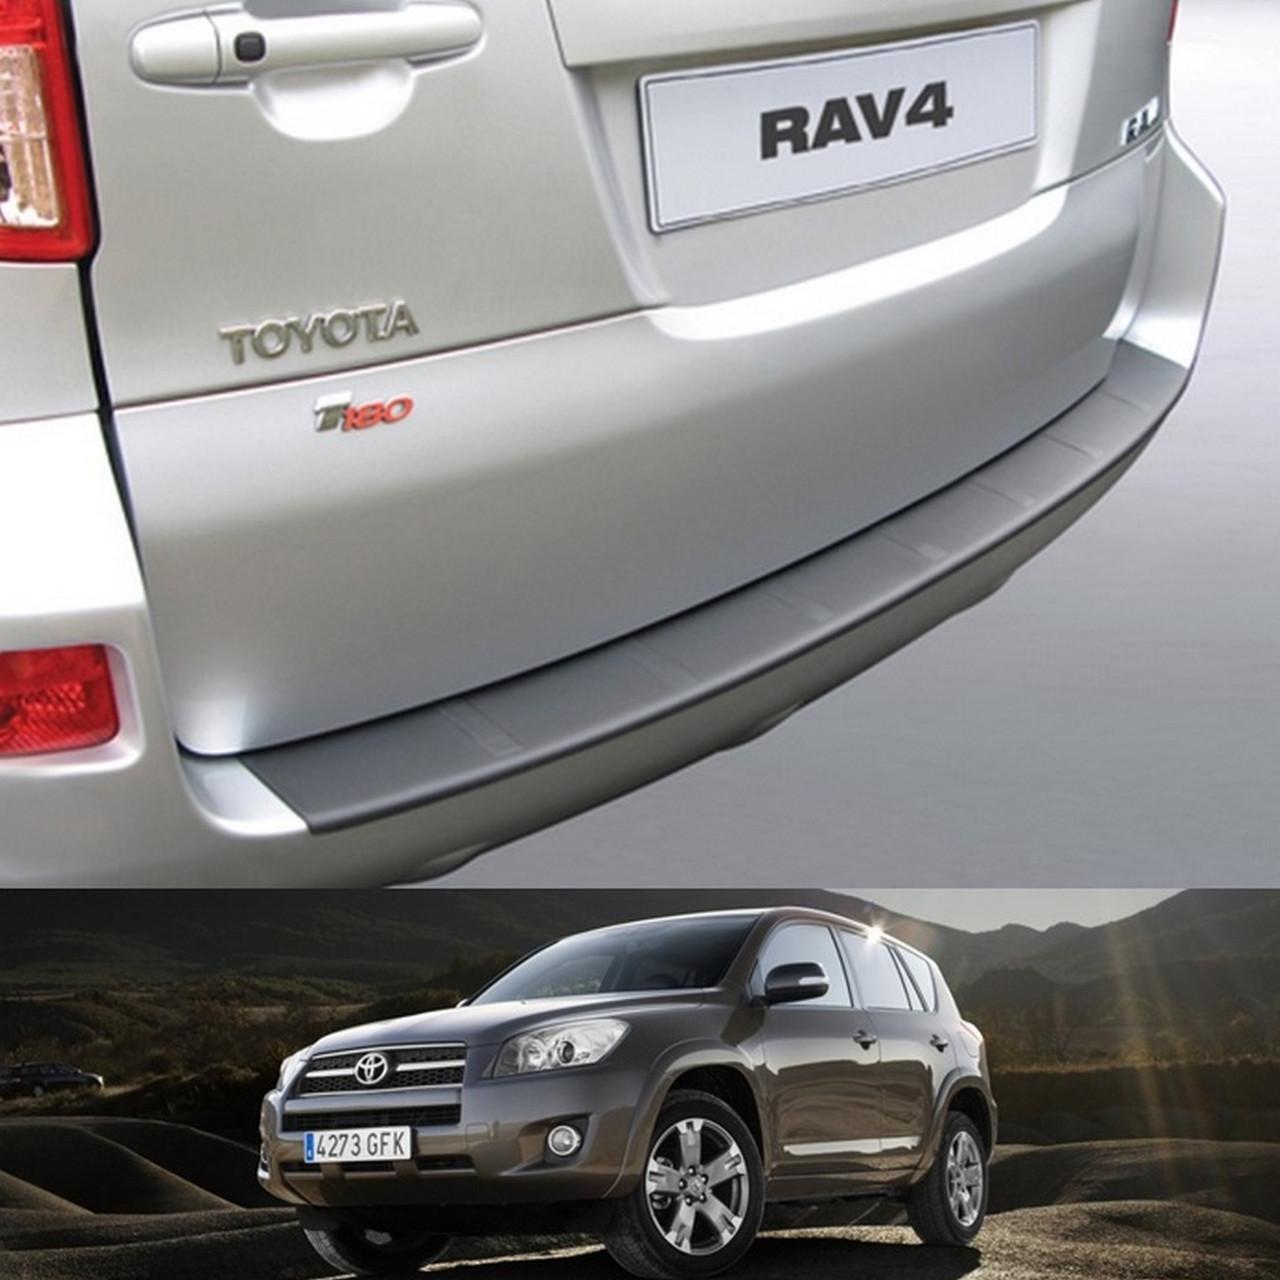 Toyota RAV-4 lift. 2008-2012 (без запаски) пластиковая накладка заднего бампера